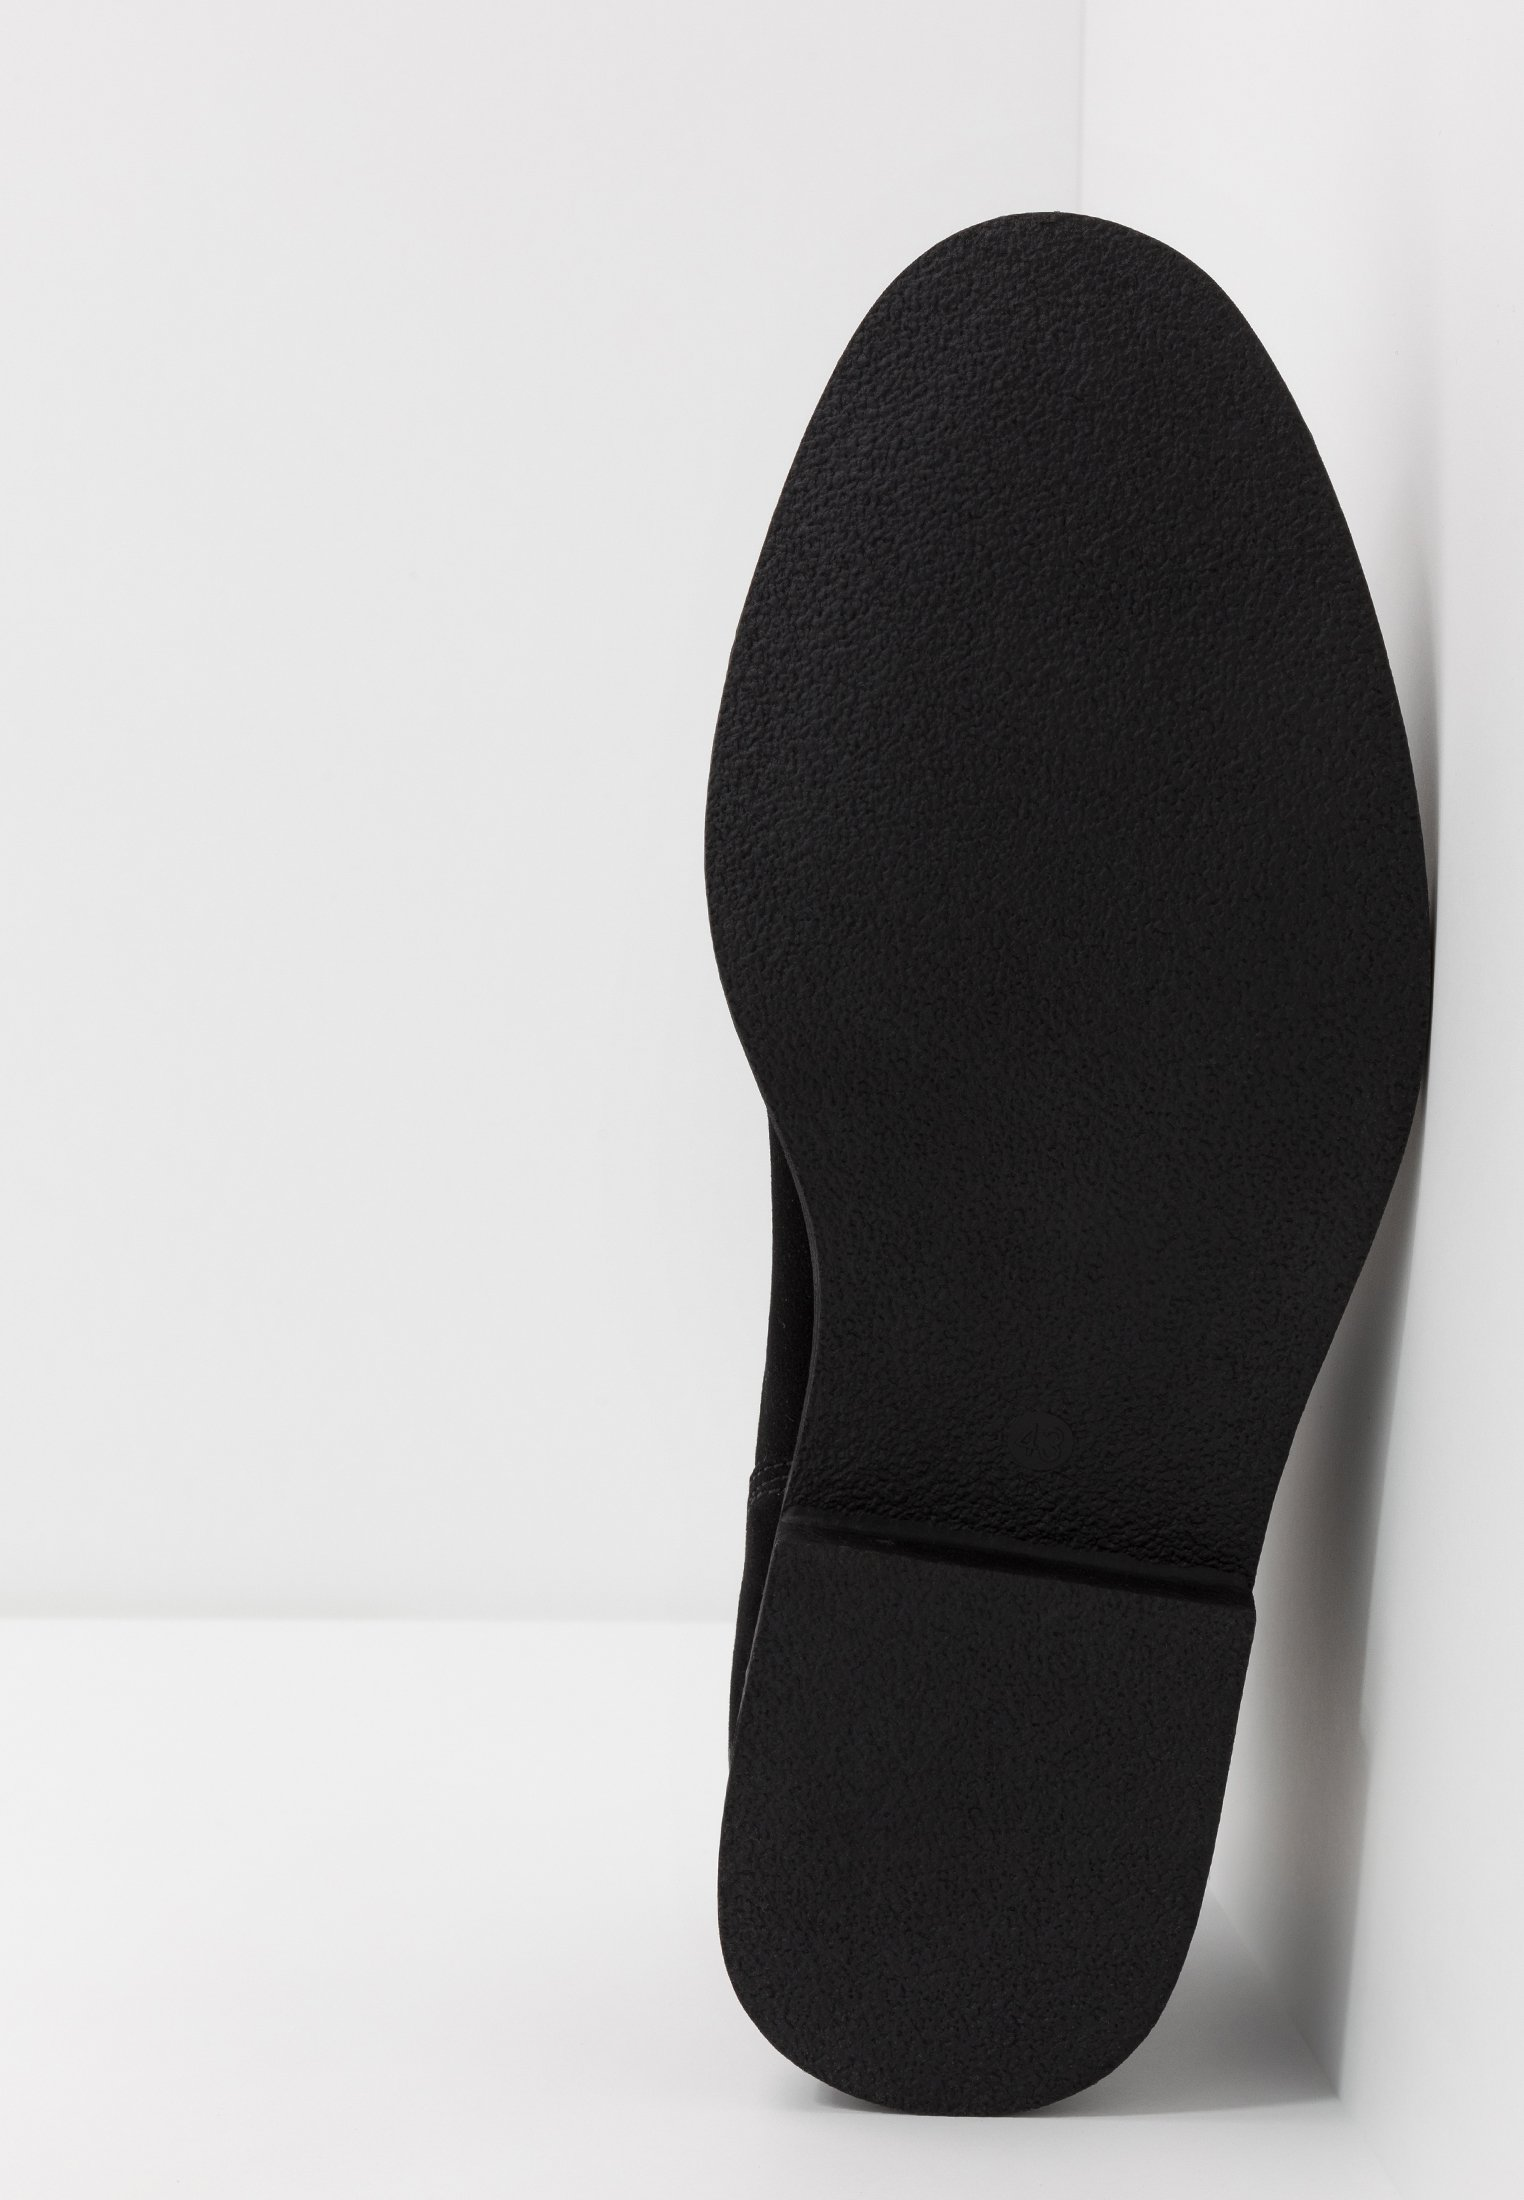 Topman SPARK CHELSEA - Stiefelette - black - Black Friday